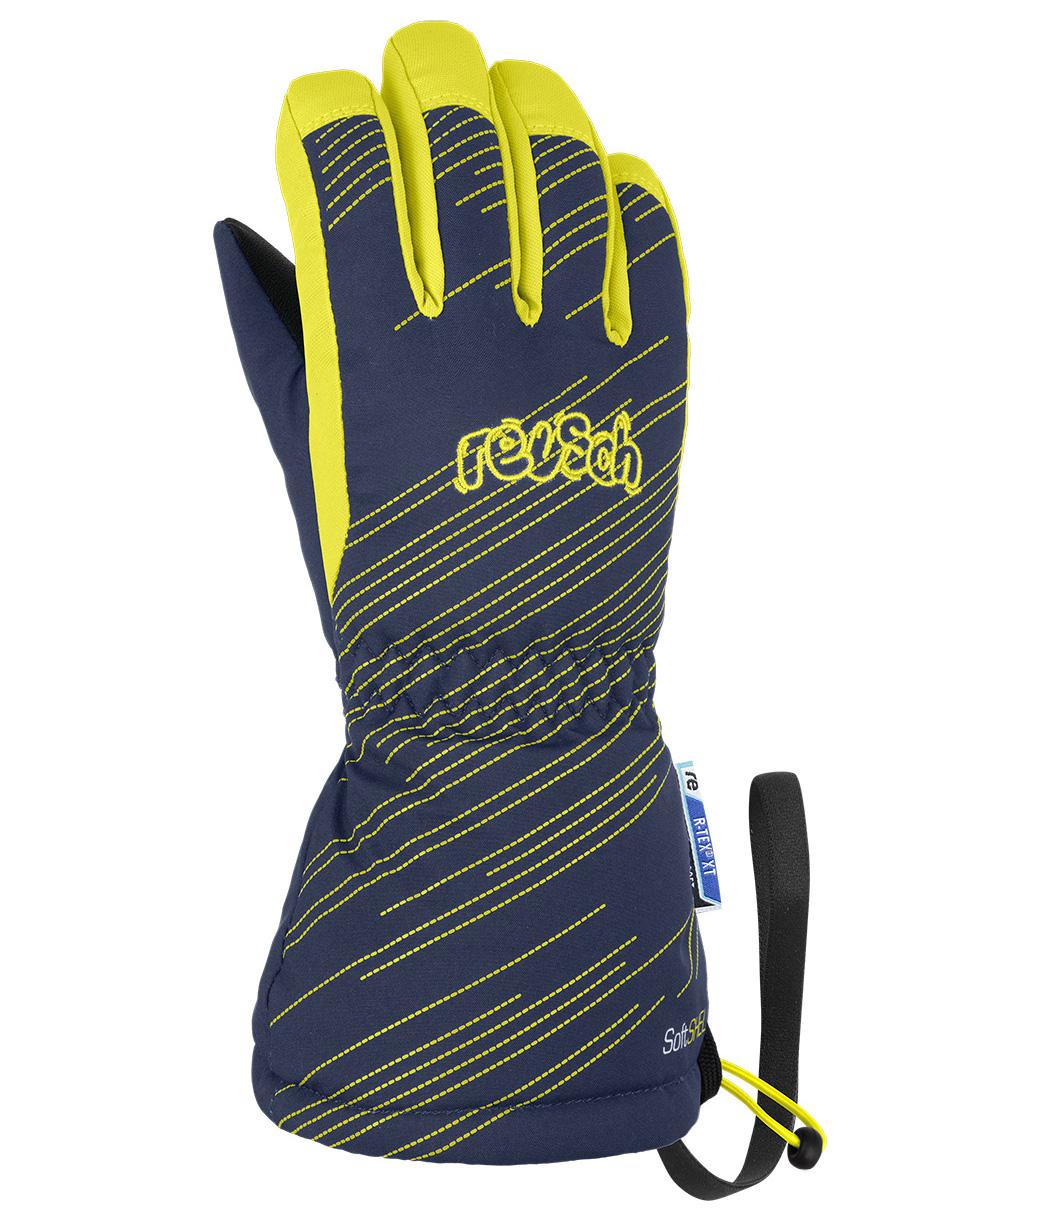 Перчатки Горнолыжные Reusch 2020-21 Maxi R-Tex Xt Dress Blue/Lime (Inch (Дюйм):Iv)